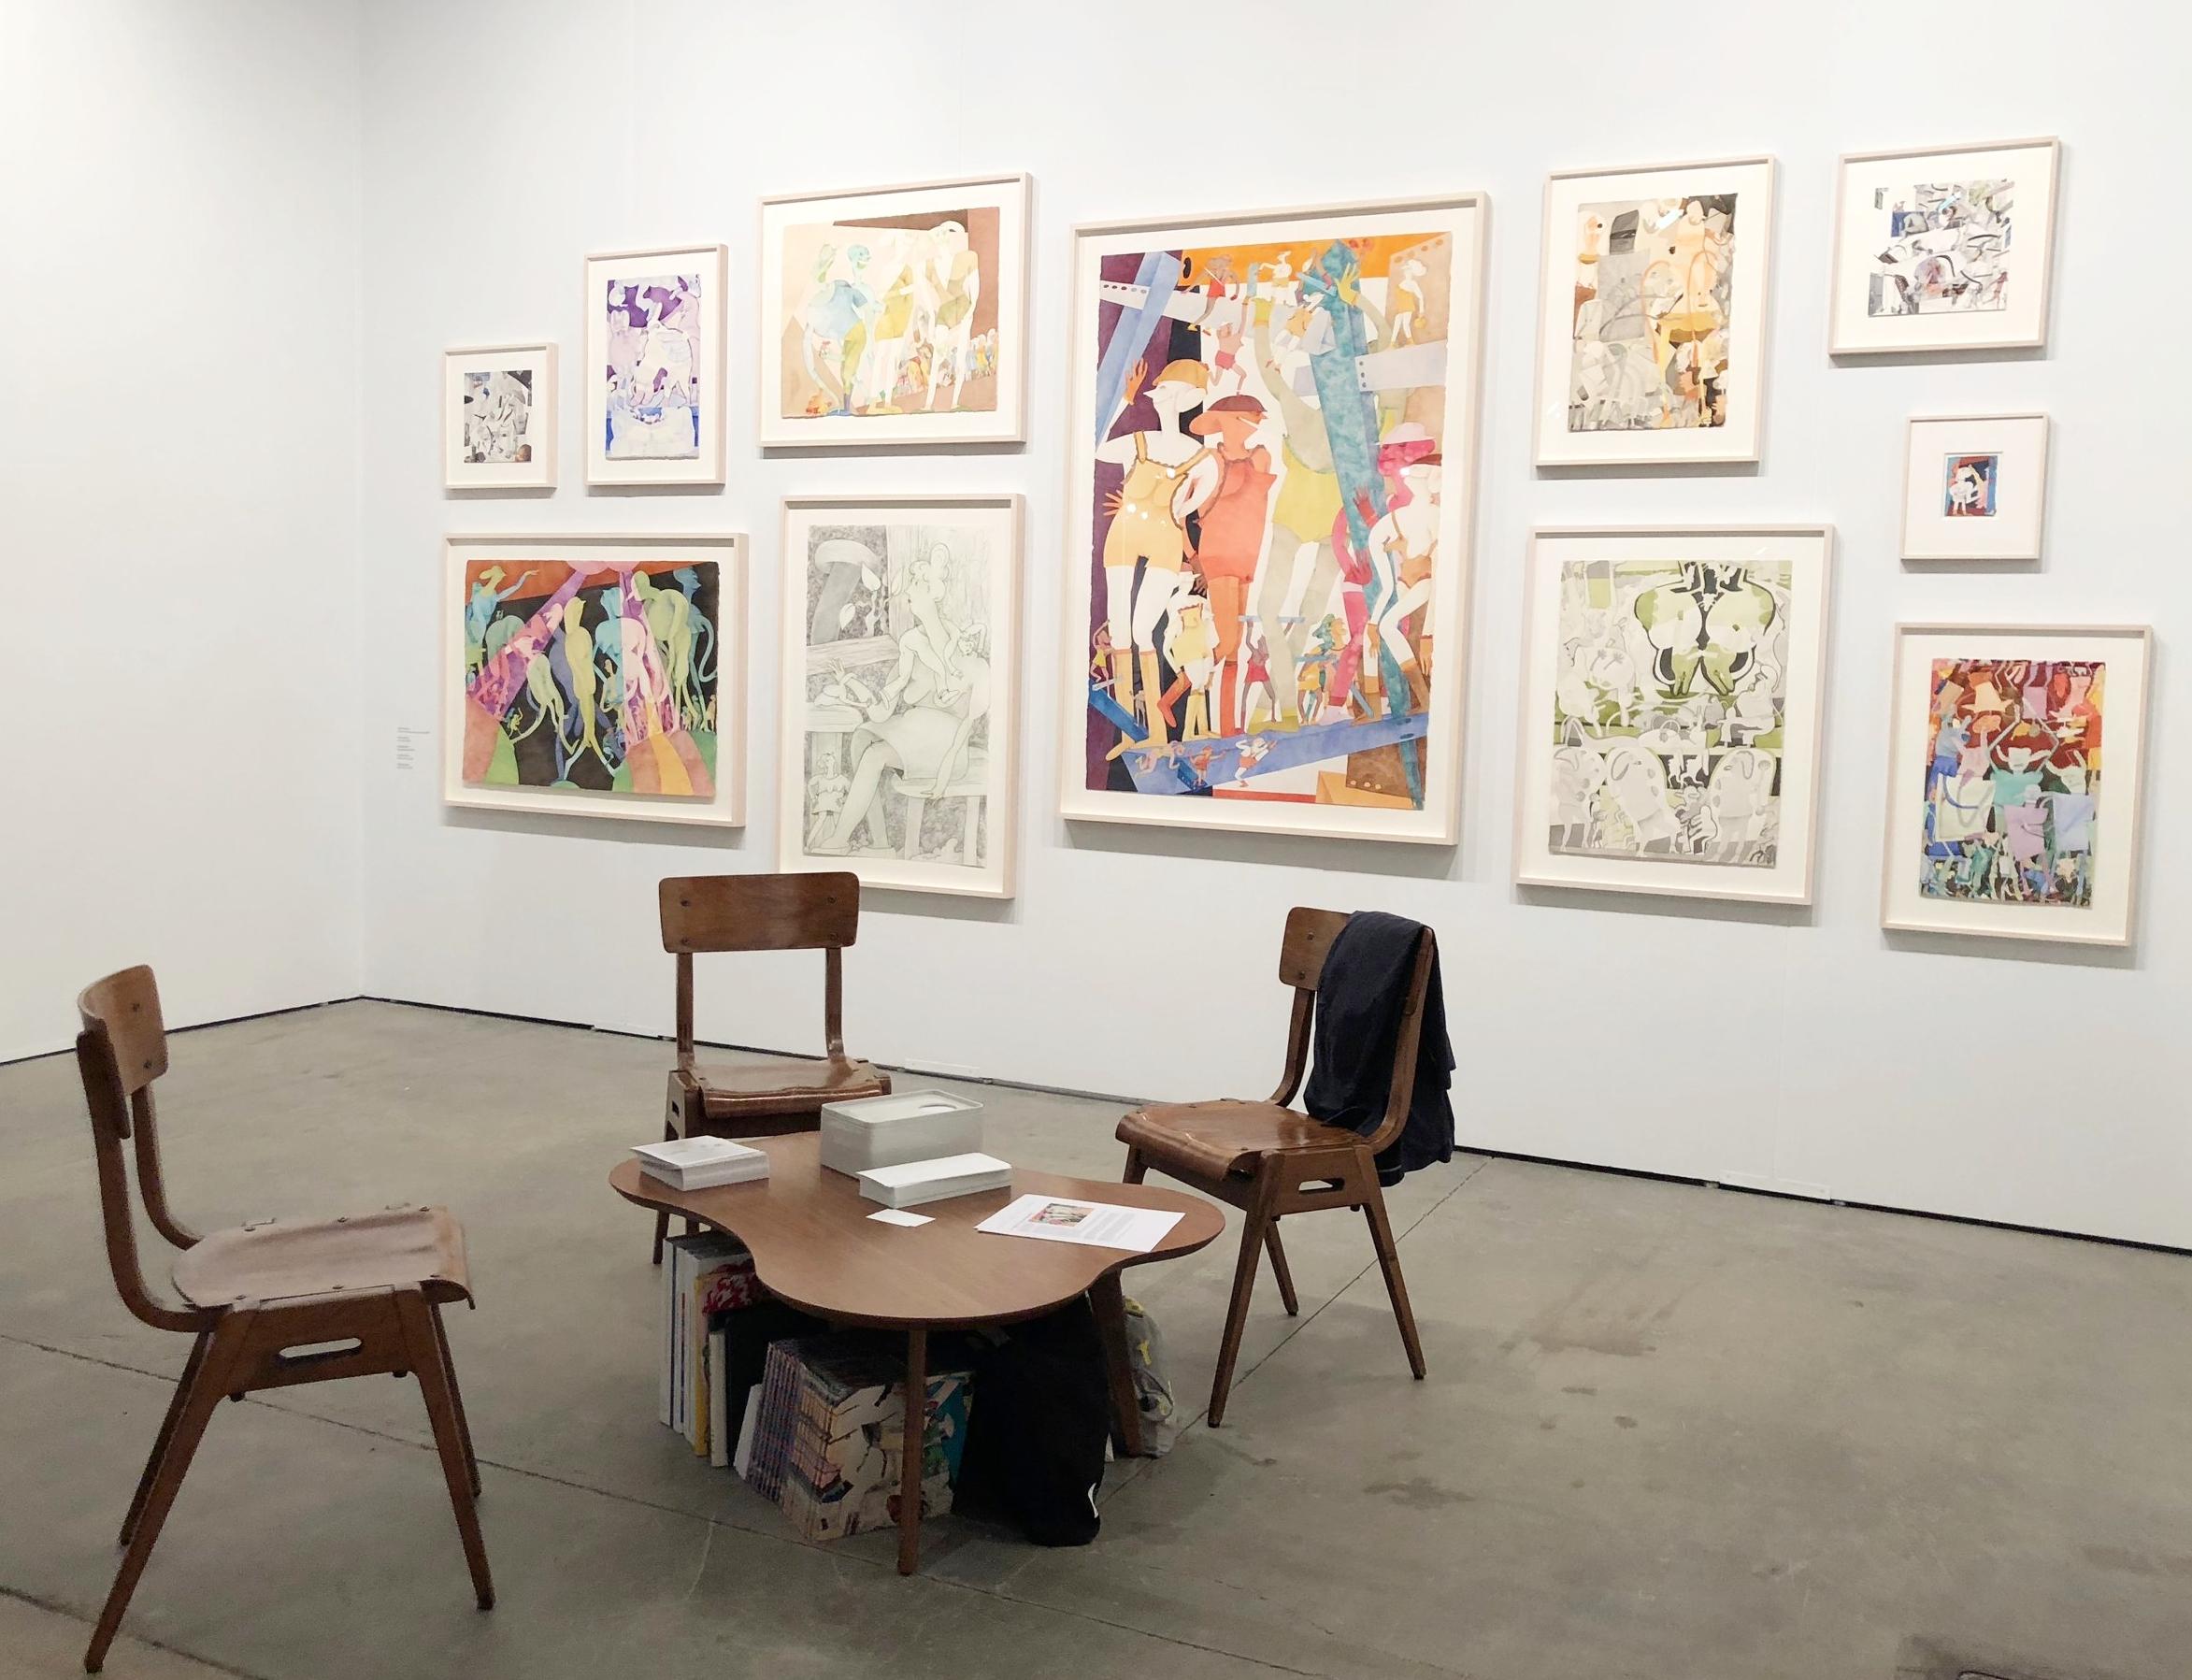 Gladys Nilsson at Garth Greenan Gallery's booth at EXPO Chicago